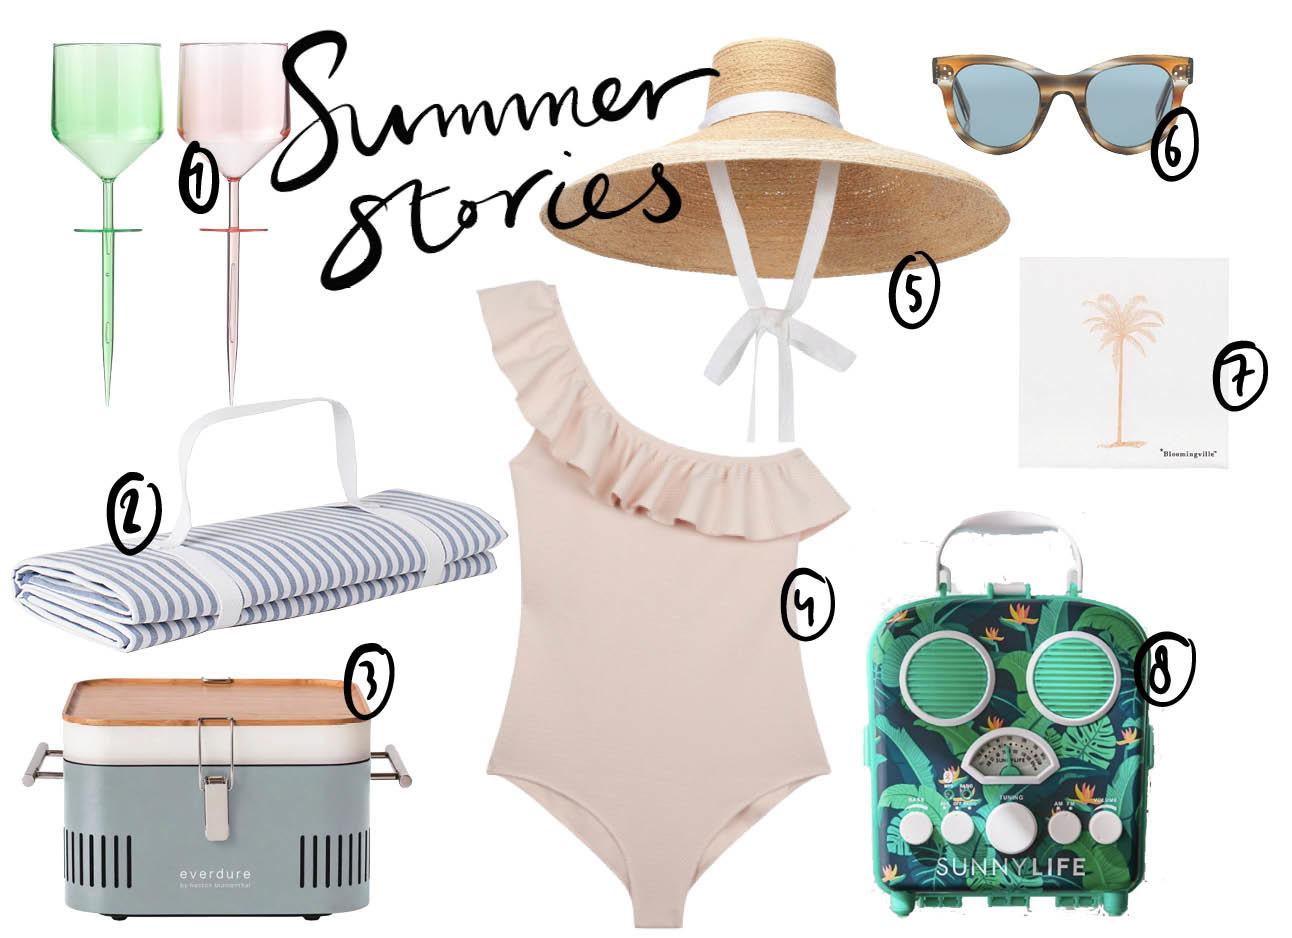 Picknick shopping badpak, kleed, glazen, hoed, zonnebril, bbq, box